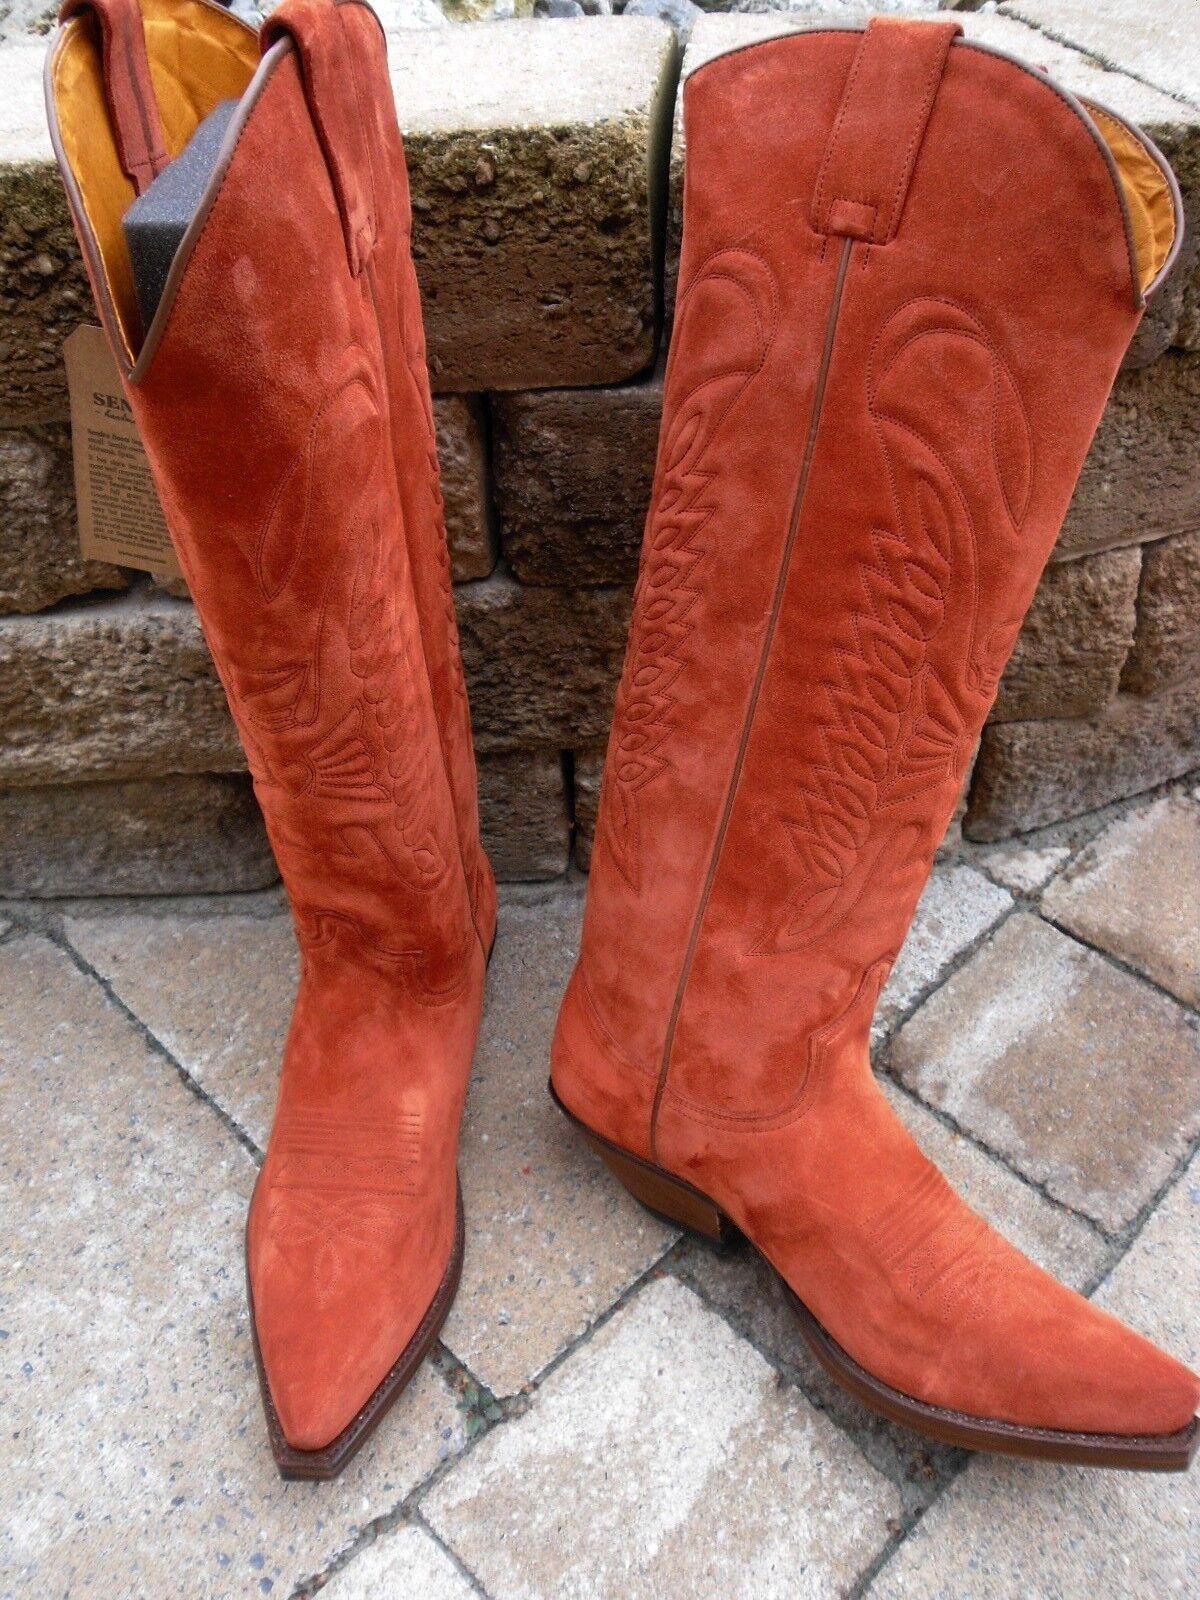 Sendra High Western botas 7167 Serraje Rust Talla 10,5 = 45 - 45,5